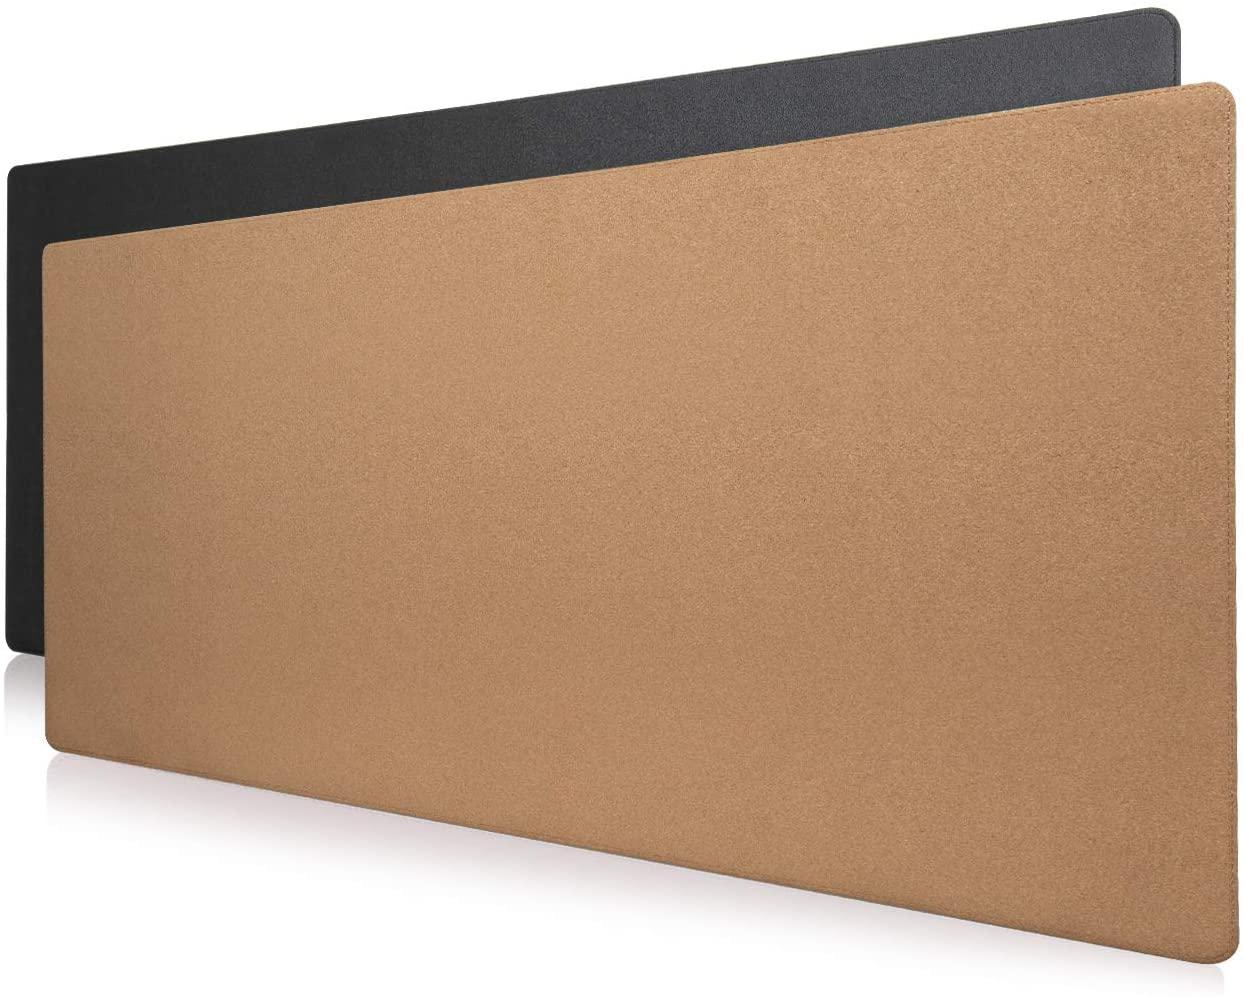 "VictSing Desk Mat (35.4"" x 17"") Mouse Pad - $9.59"